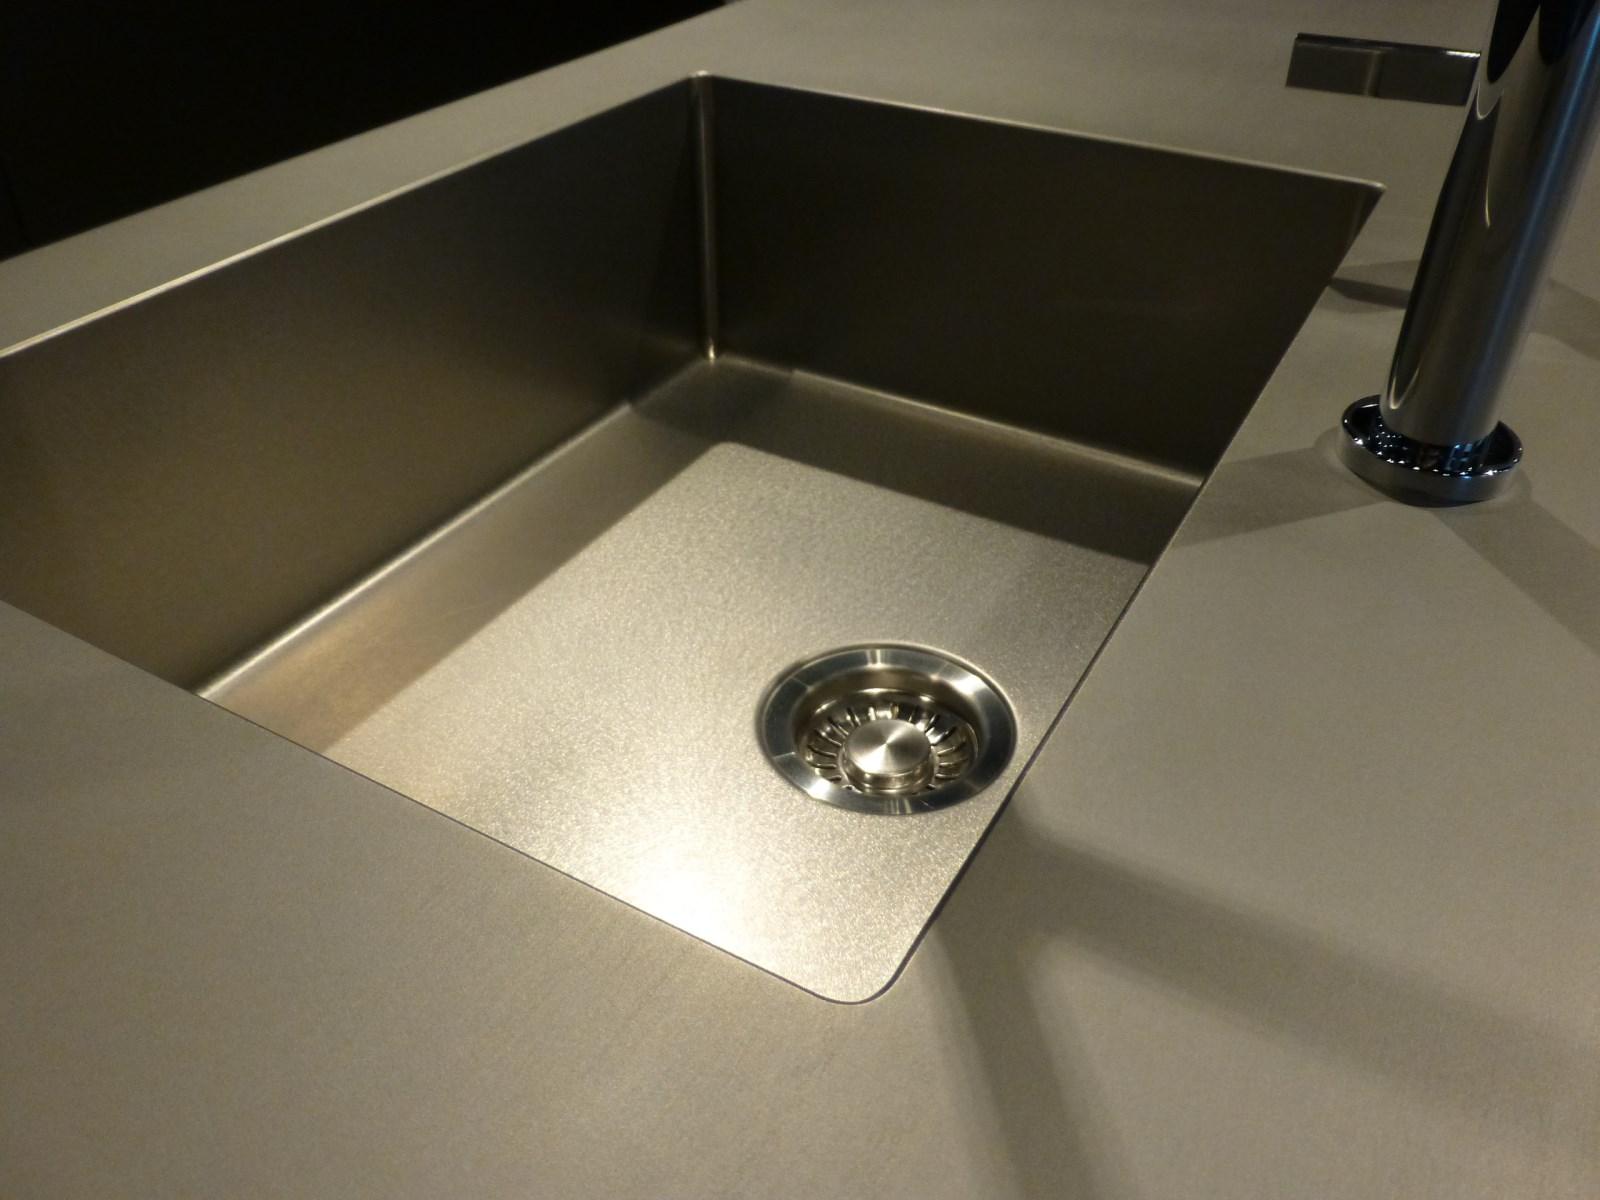 plans de travail inox 4 mm massif lamin s chaud so inox. Black Bedroom Furniture Sets. Home Design Ideas